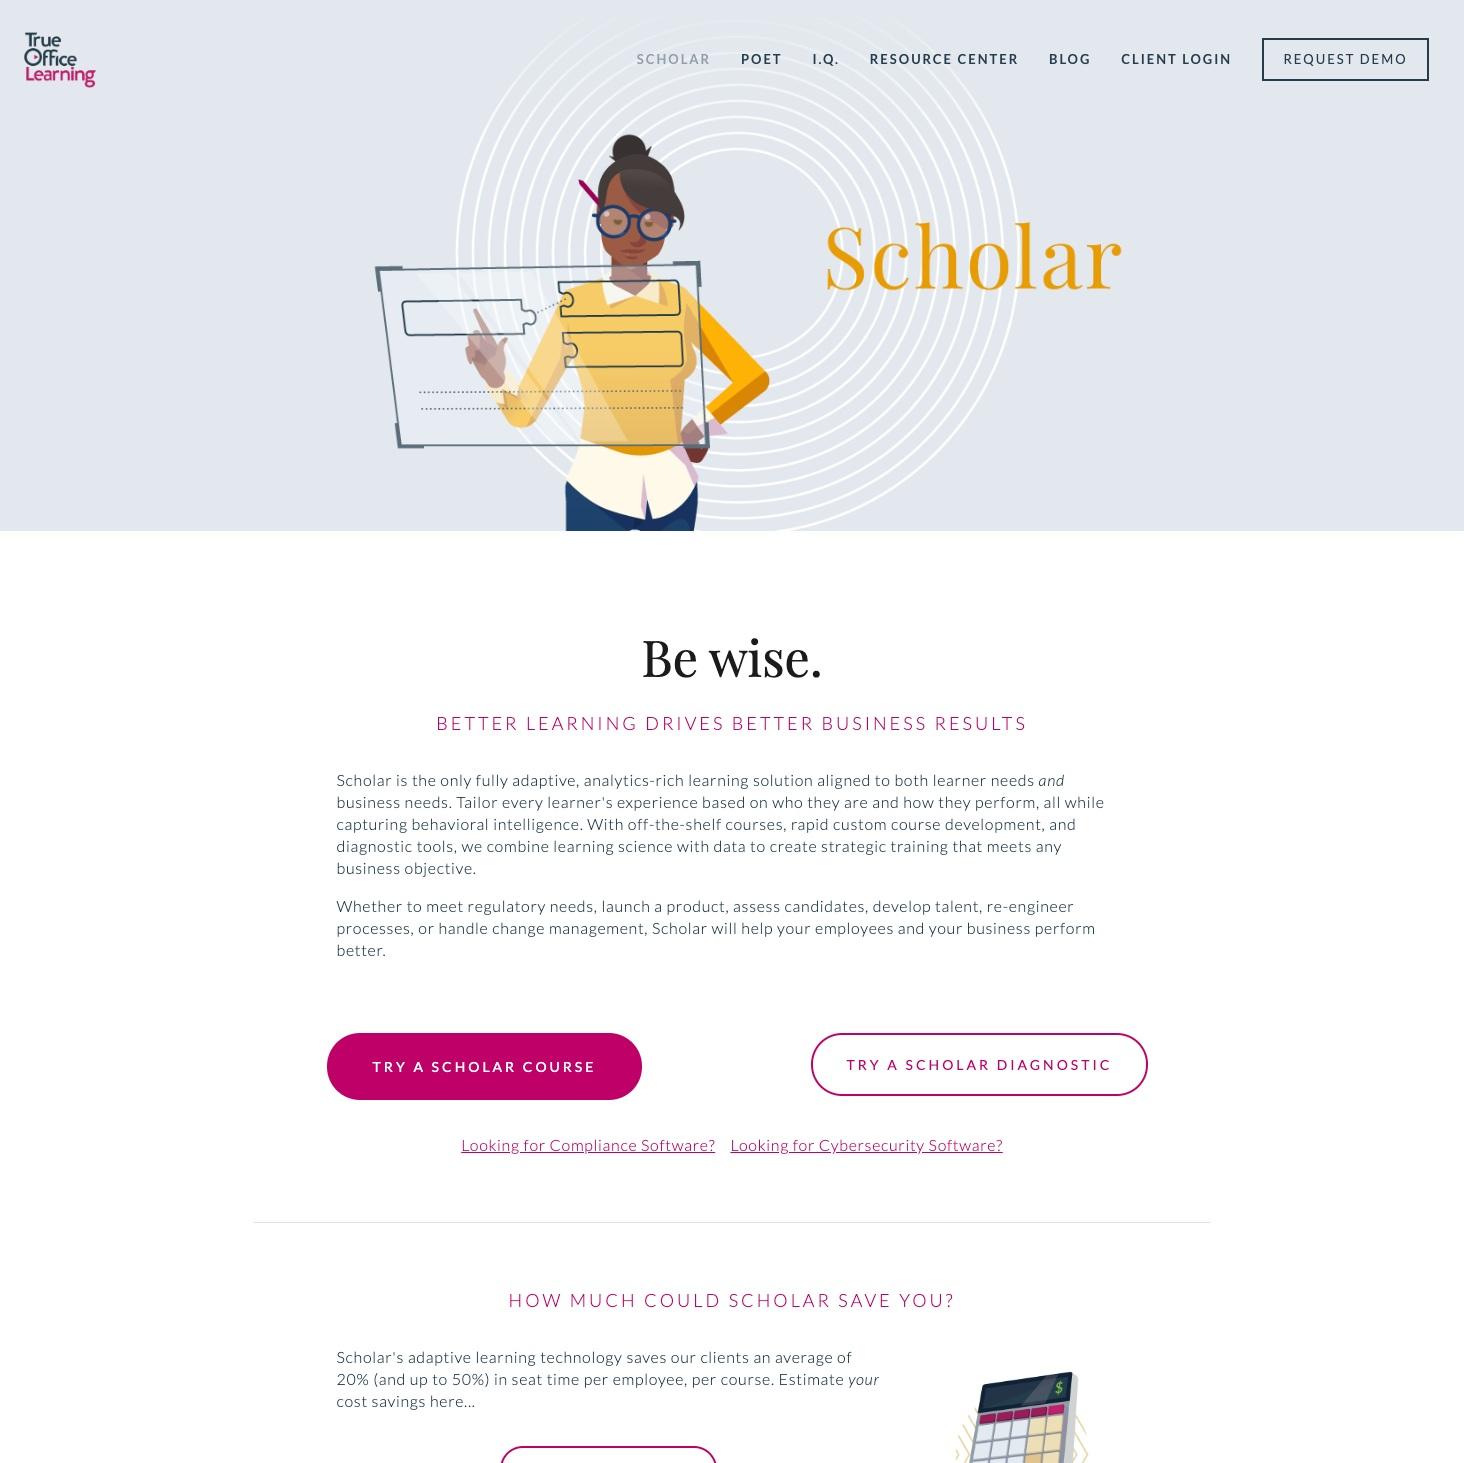 02-Scholar.png